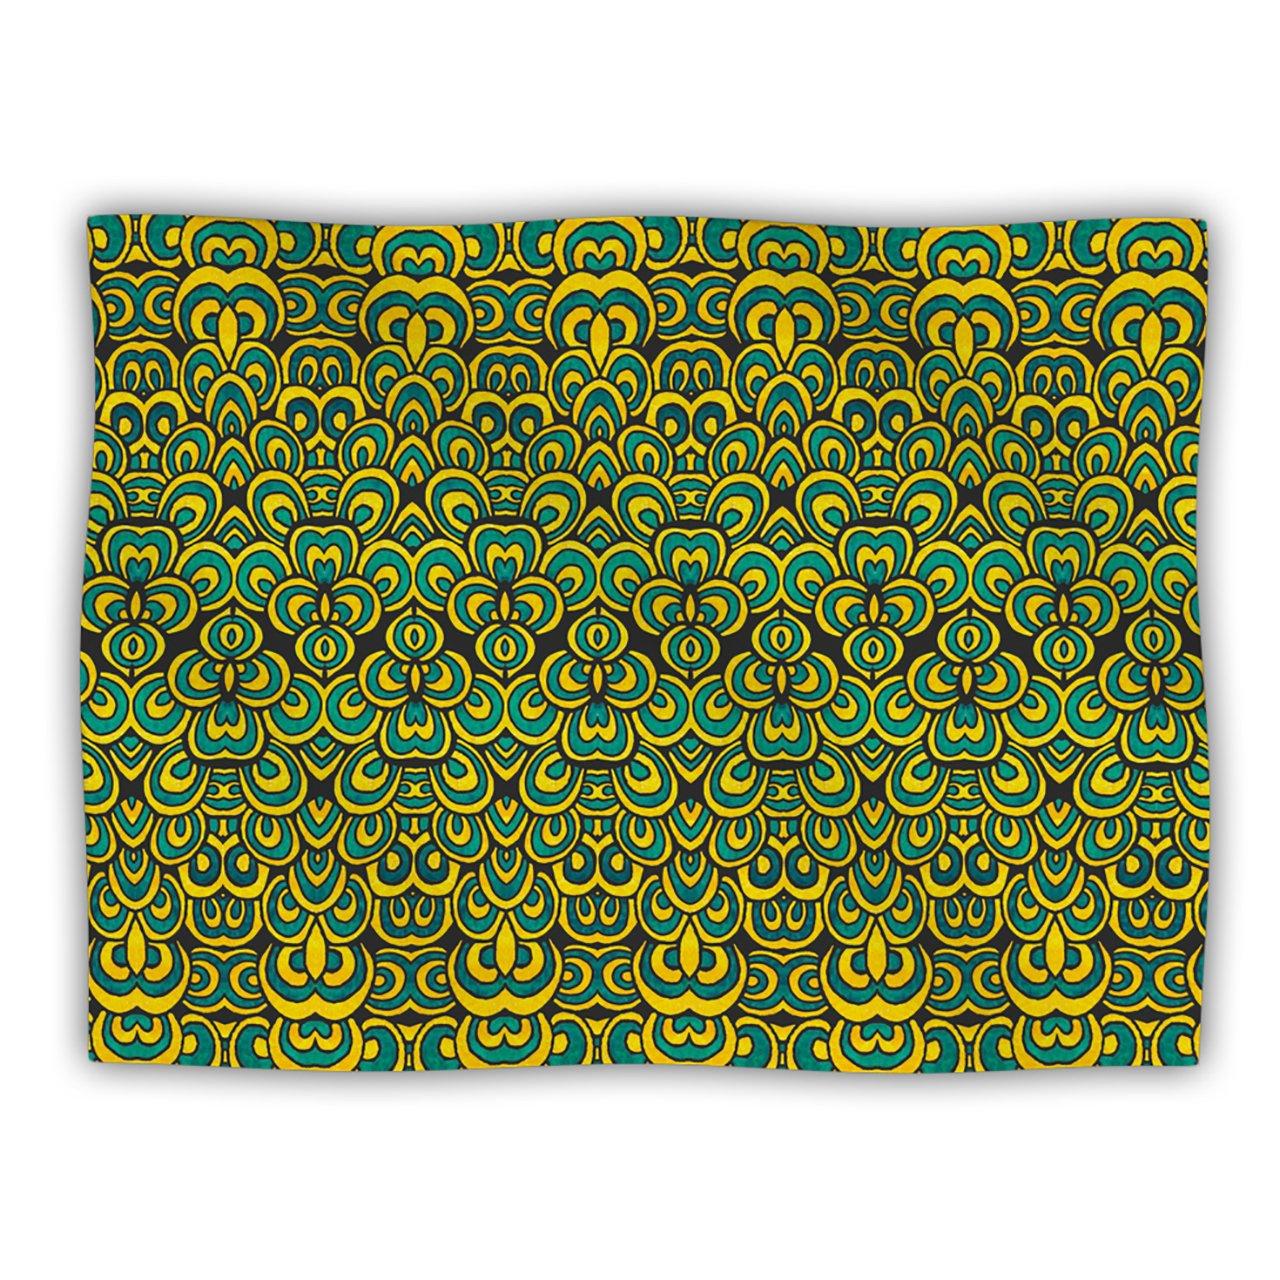 Kess InHouse Pom Graphic Design 'Animal Temple II' Dog Blanket, 40 by 30-Inch